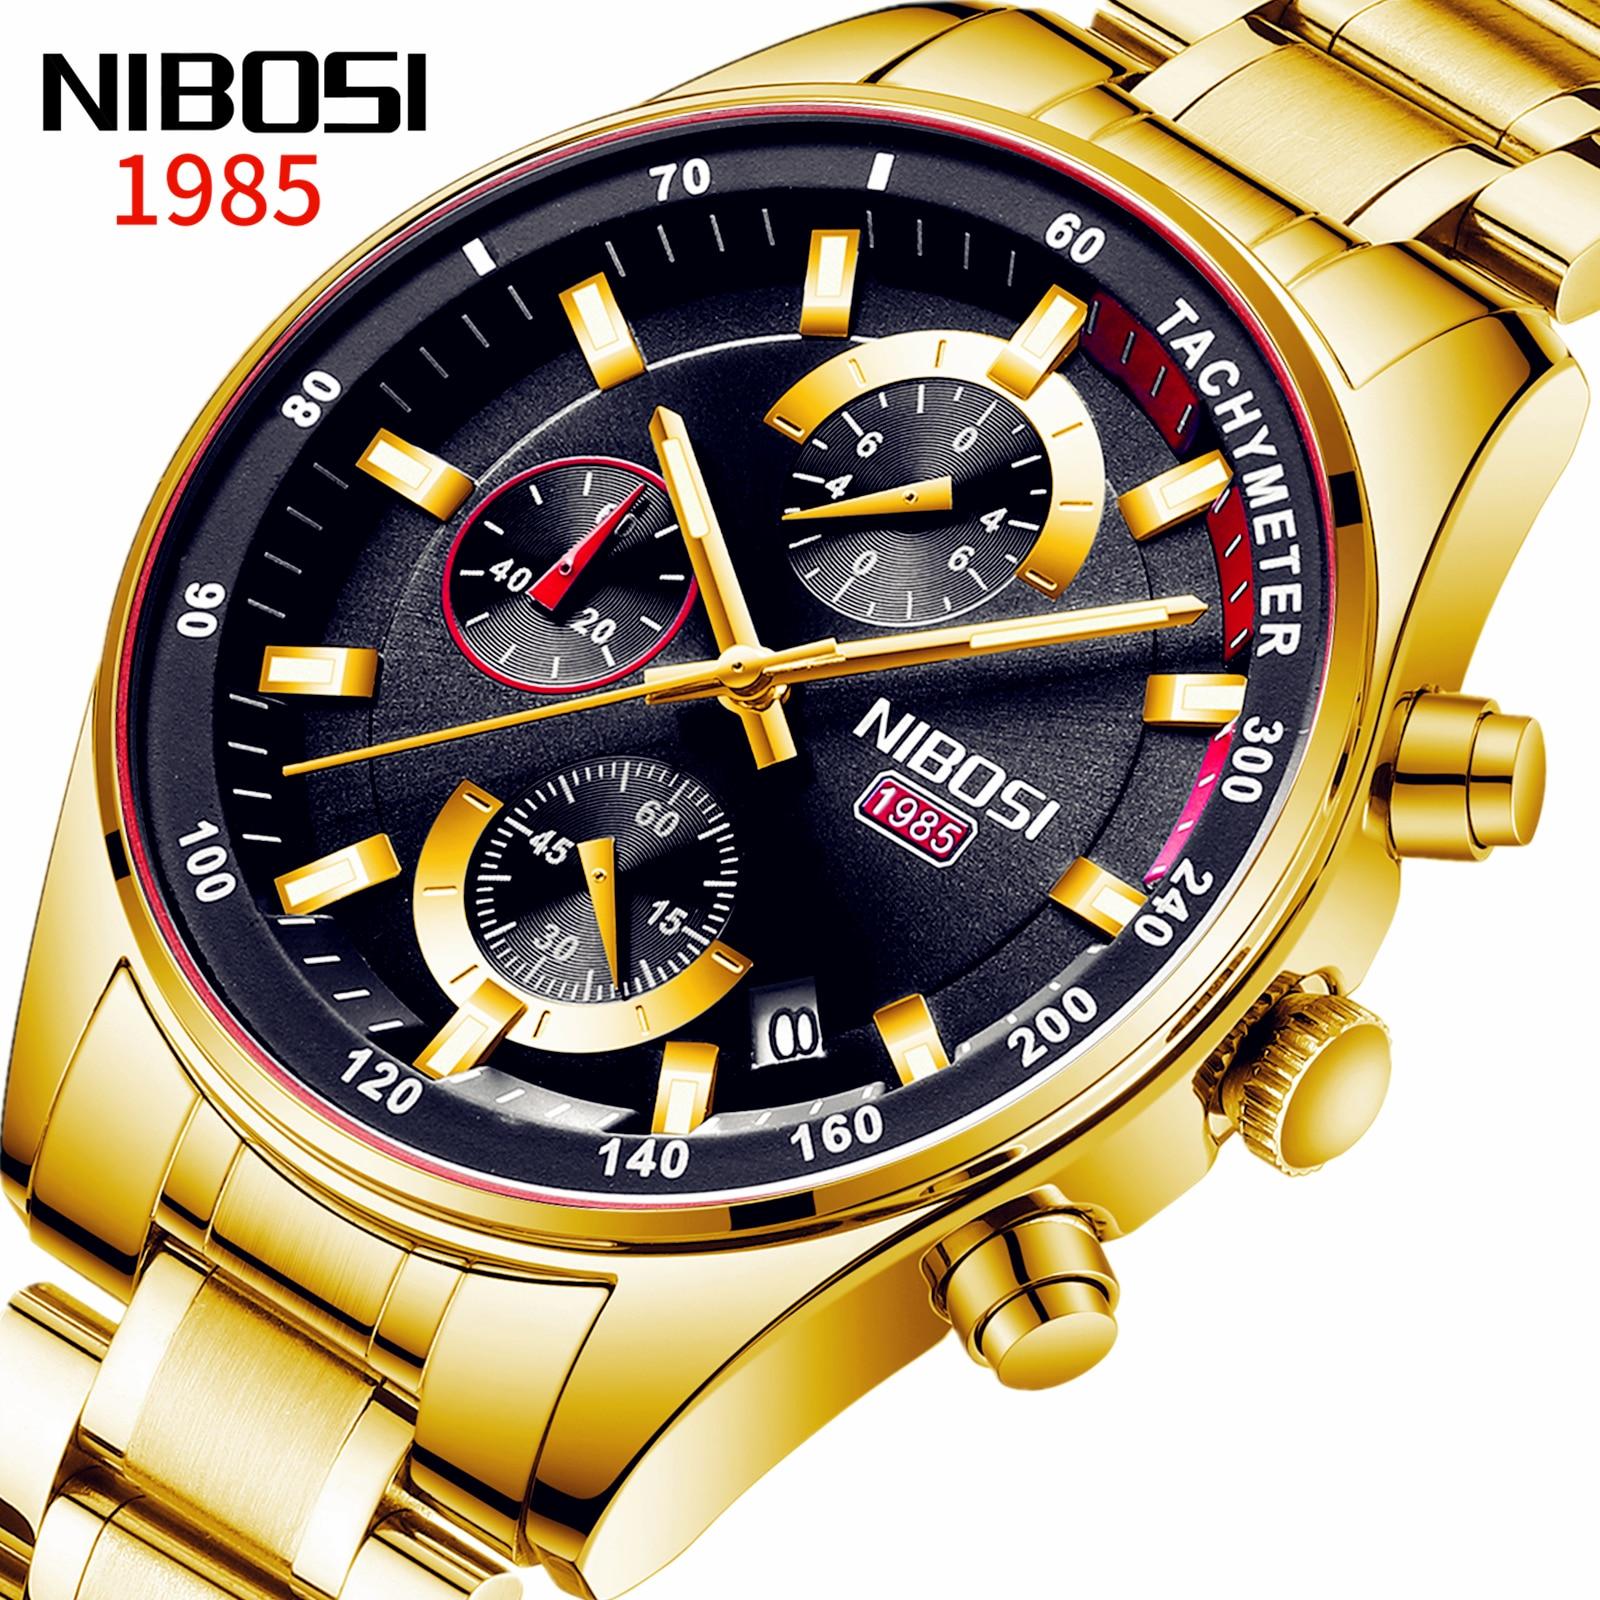 NIBOSI Fashion Mens Watches Top Brand Luxury Wrist Watch Quartz Clock Gold Men Chronograph Waterproof Relogio Masculino